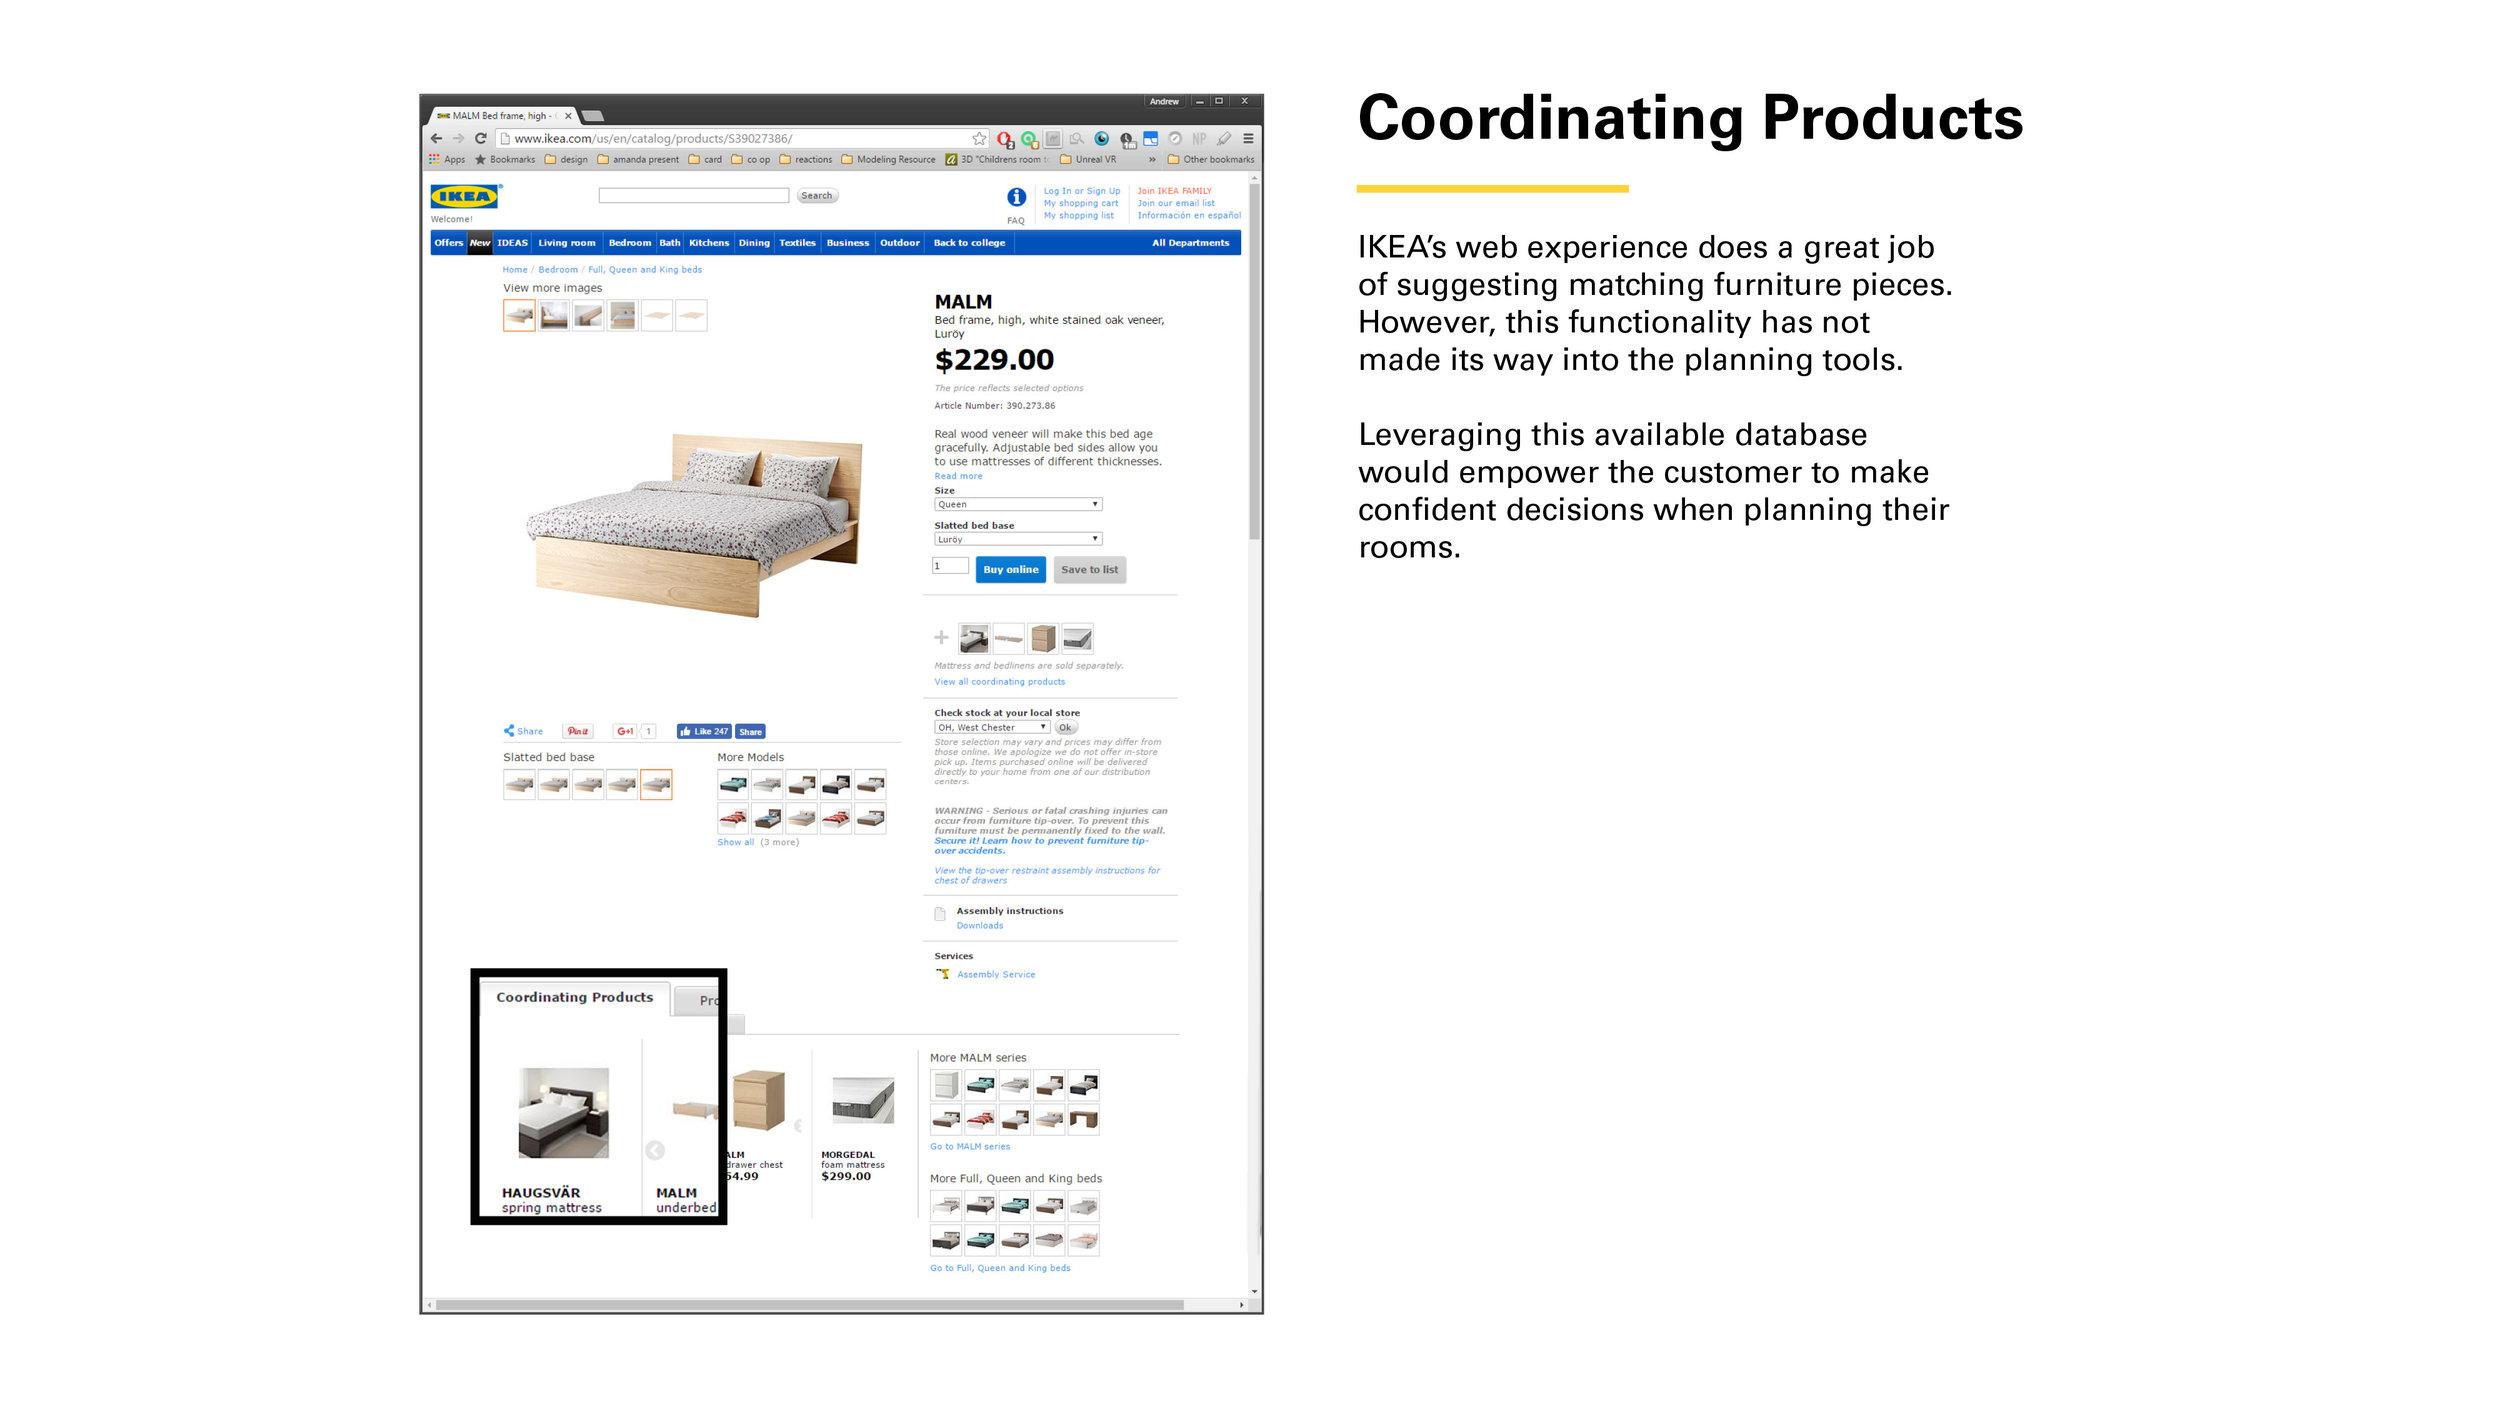 IKEA_AR_Planner_ProcessBook16.jpg